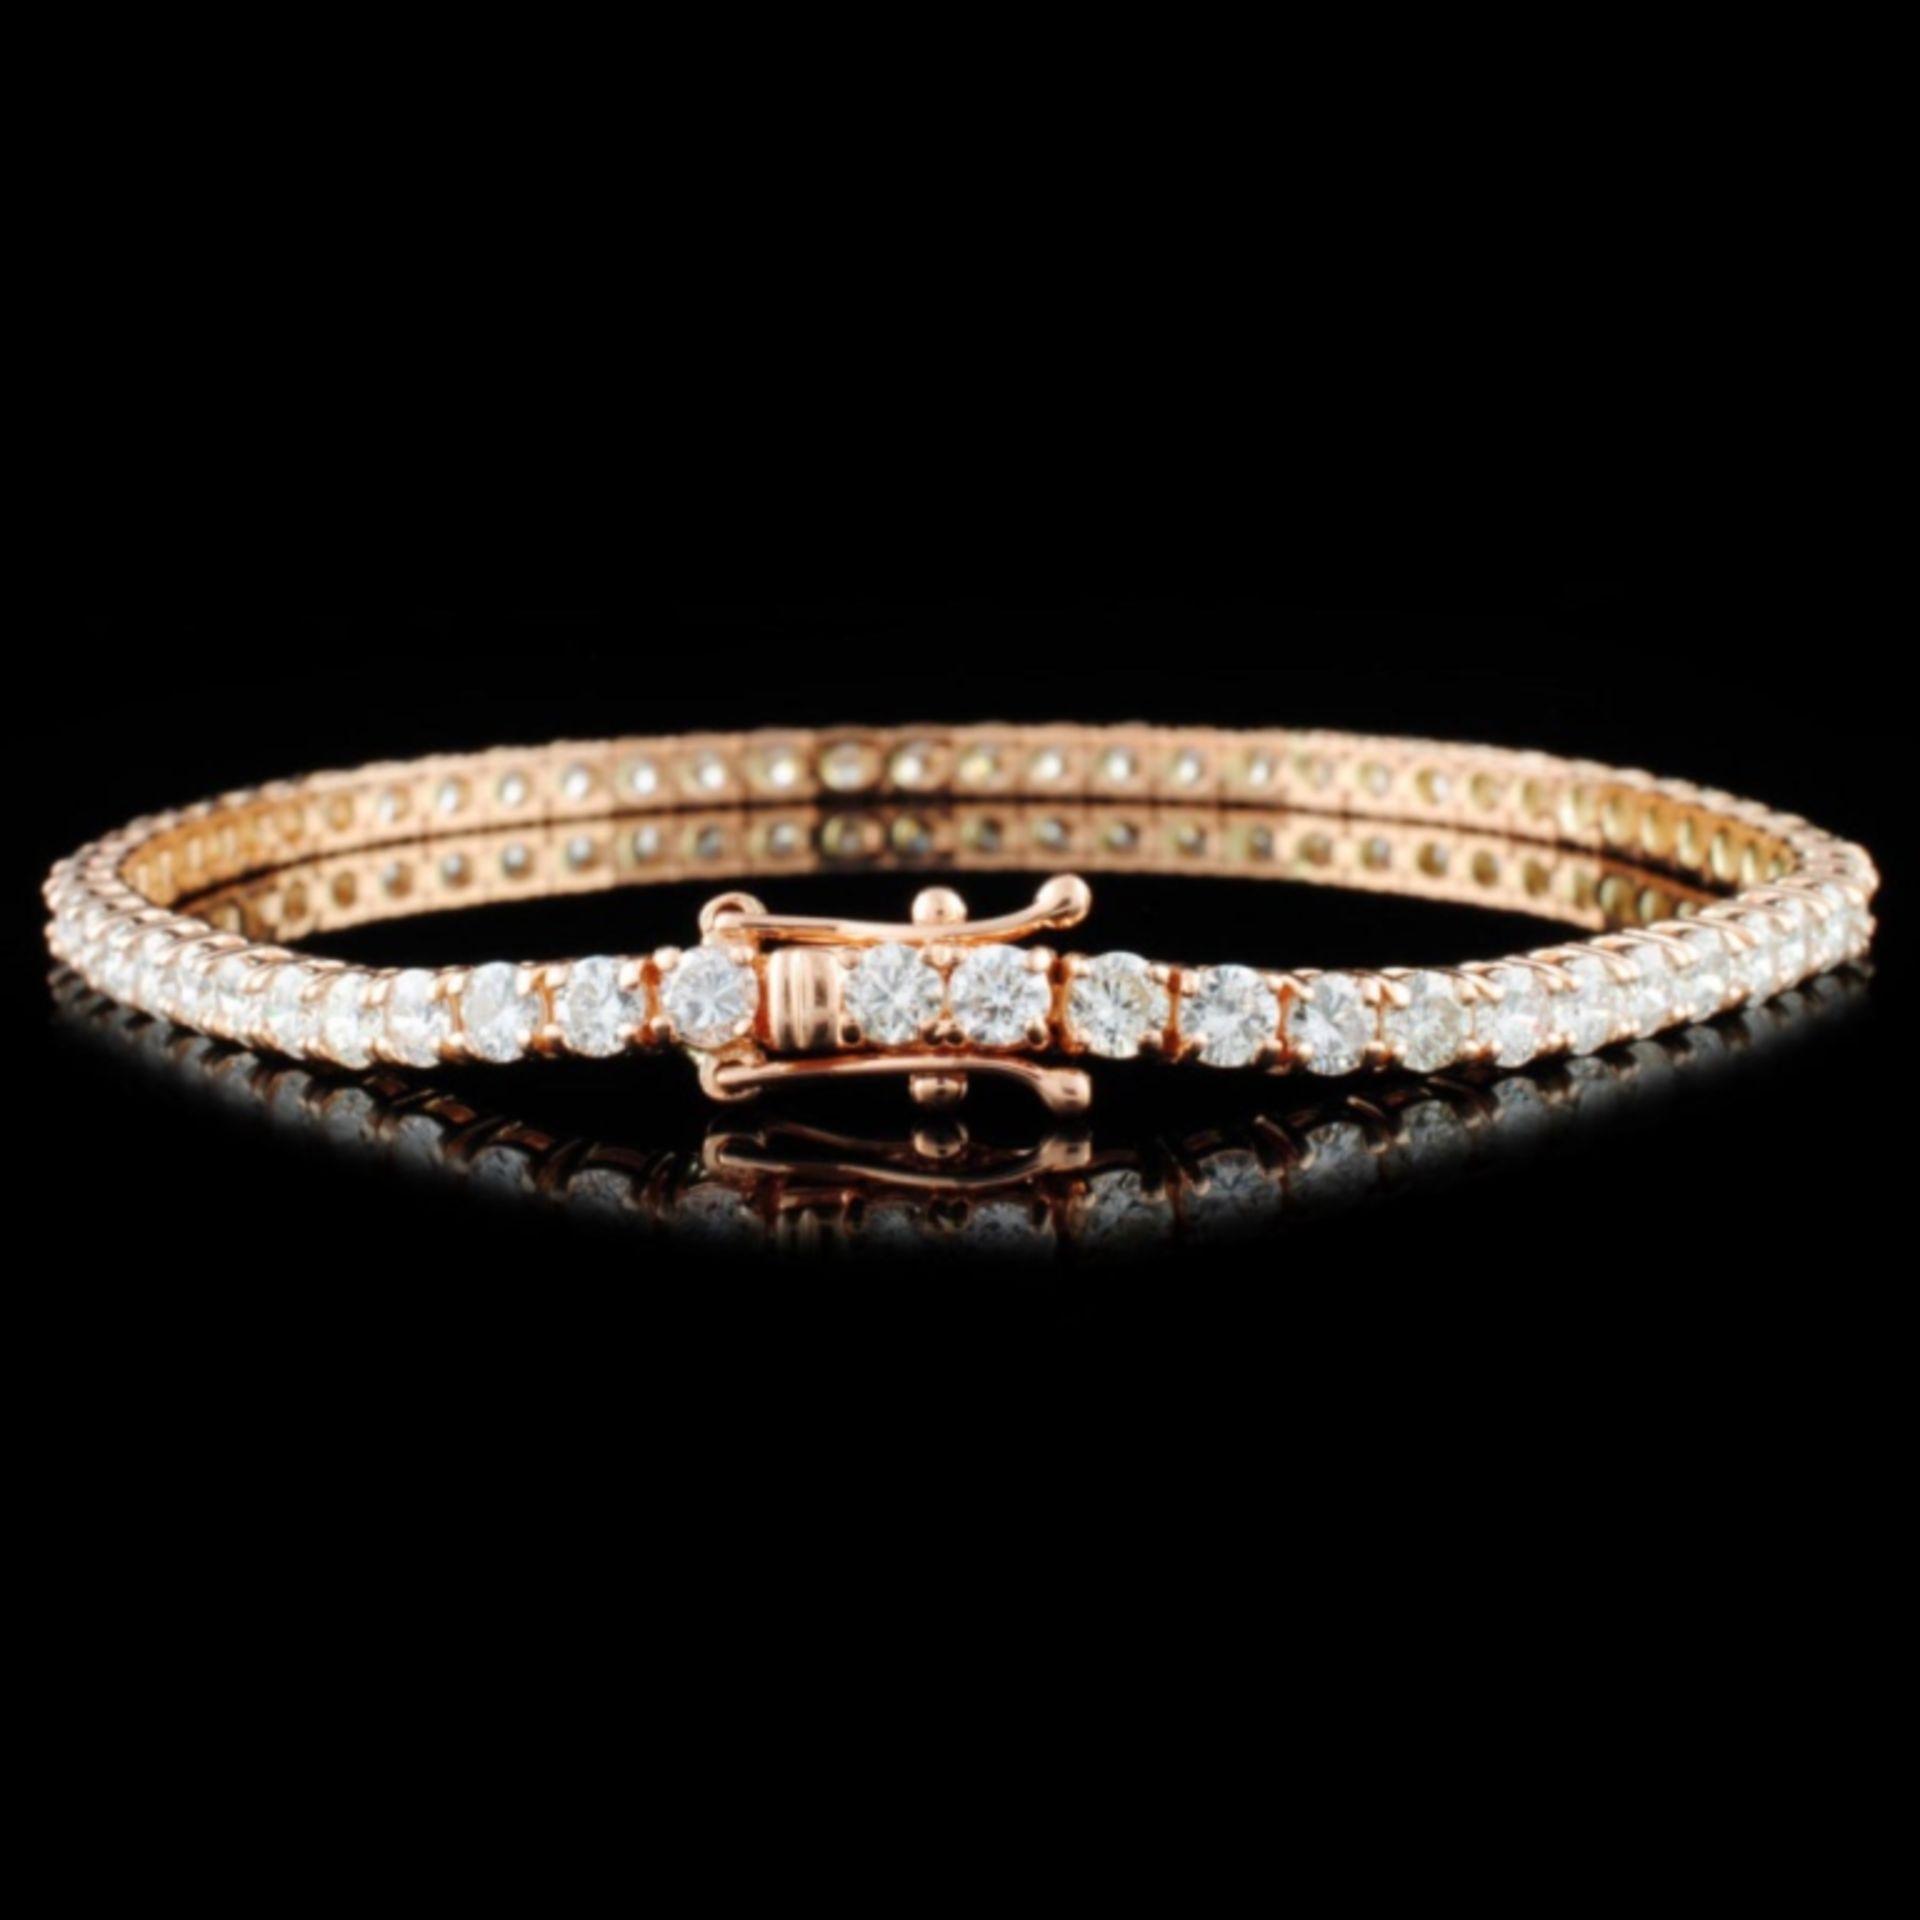 14K Gold 5.20ctw Diamond Bracelet - Image 2 of 3